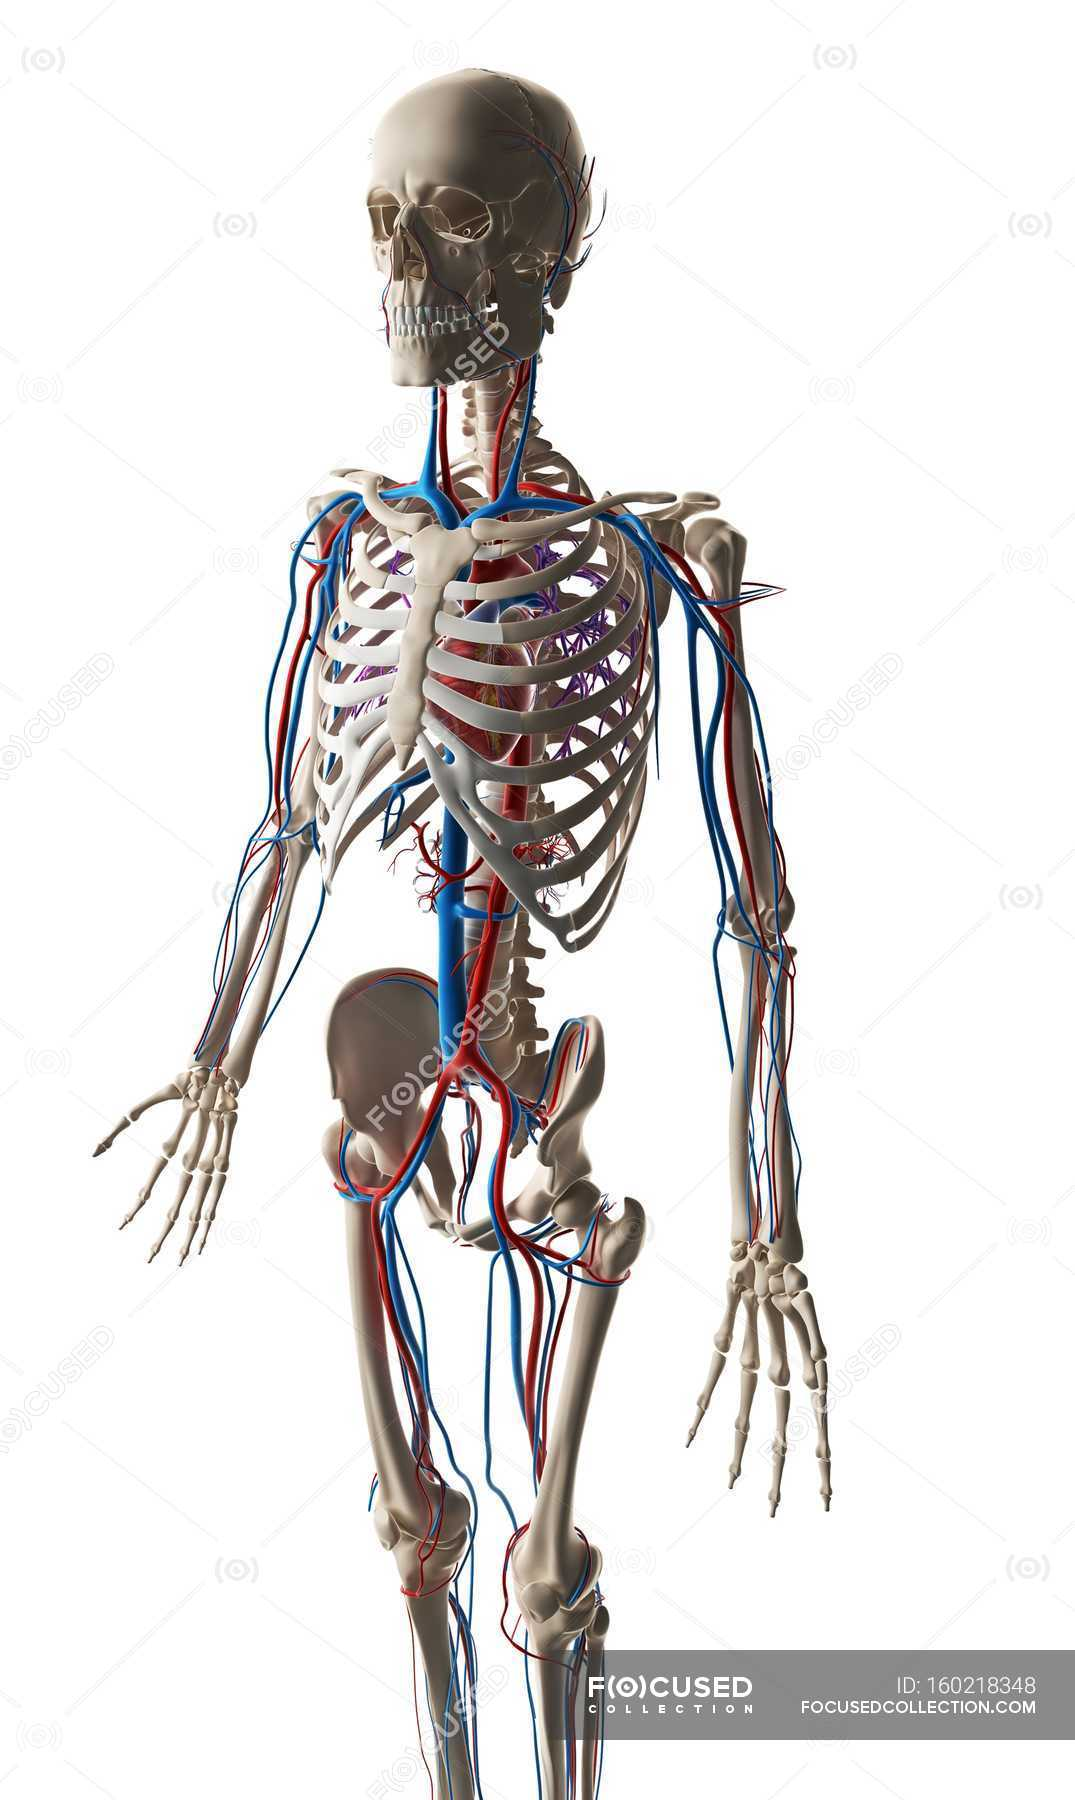 Human Vascular System Stock Photo 160218348